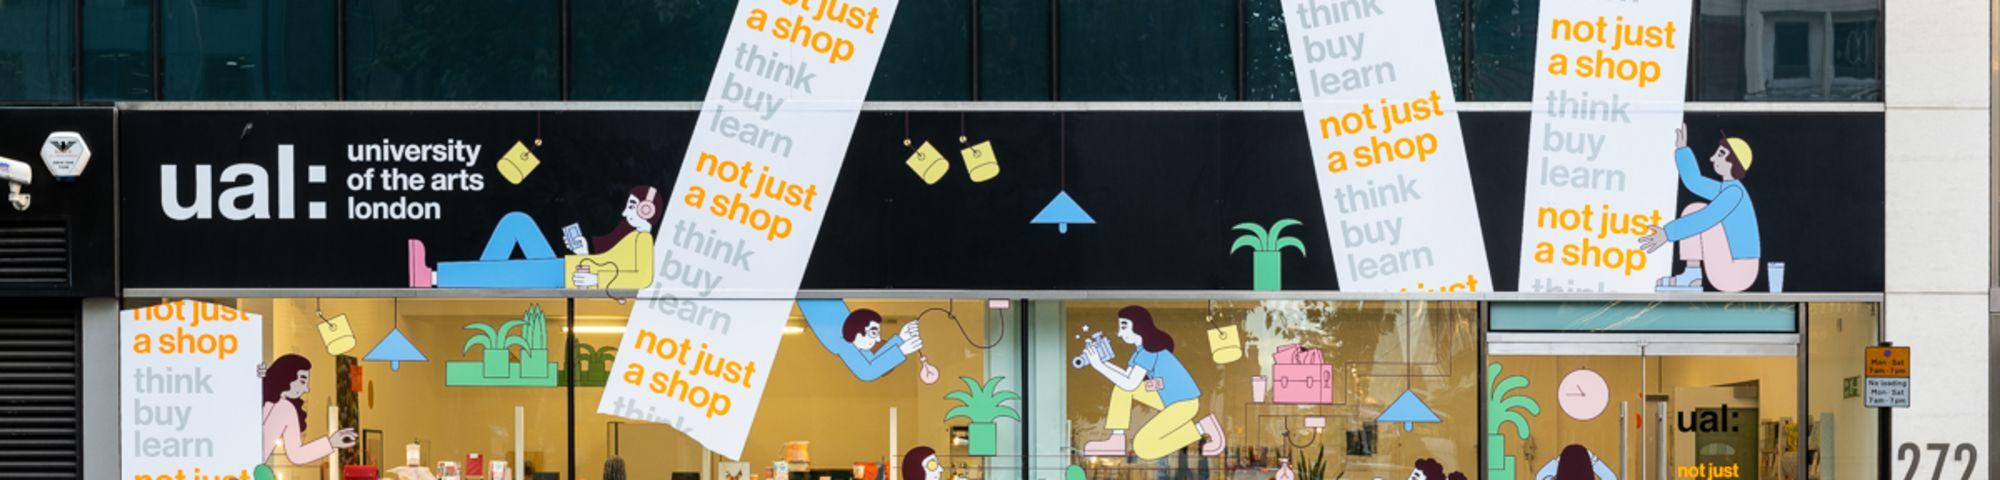 Not just a shop window